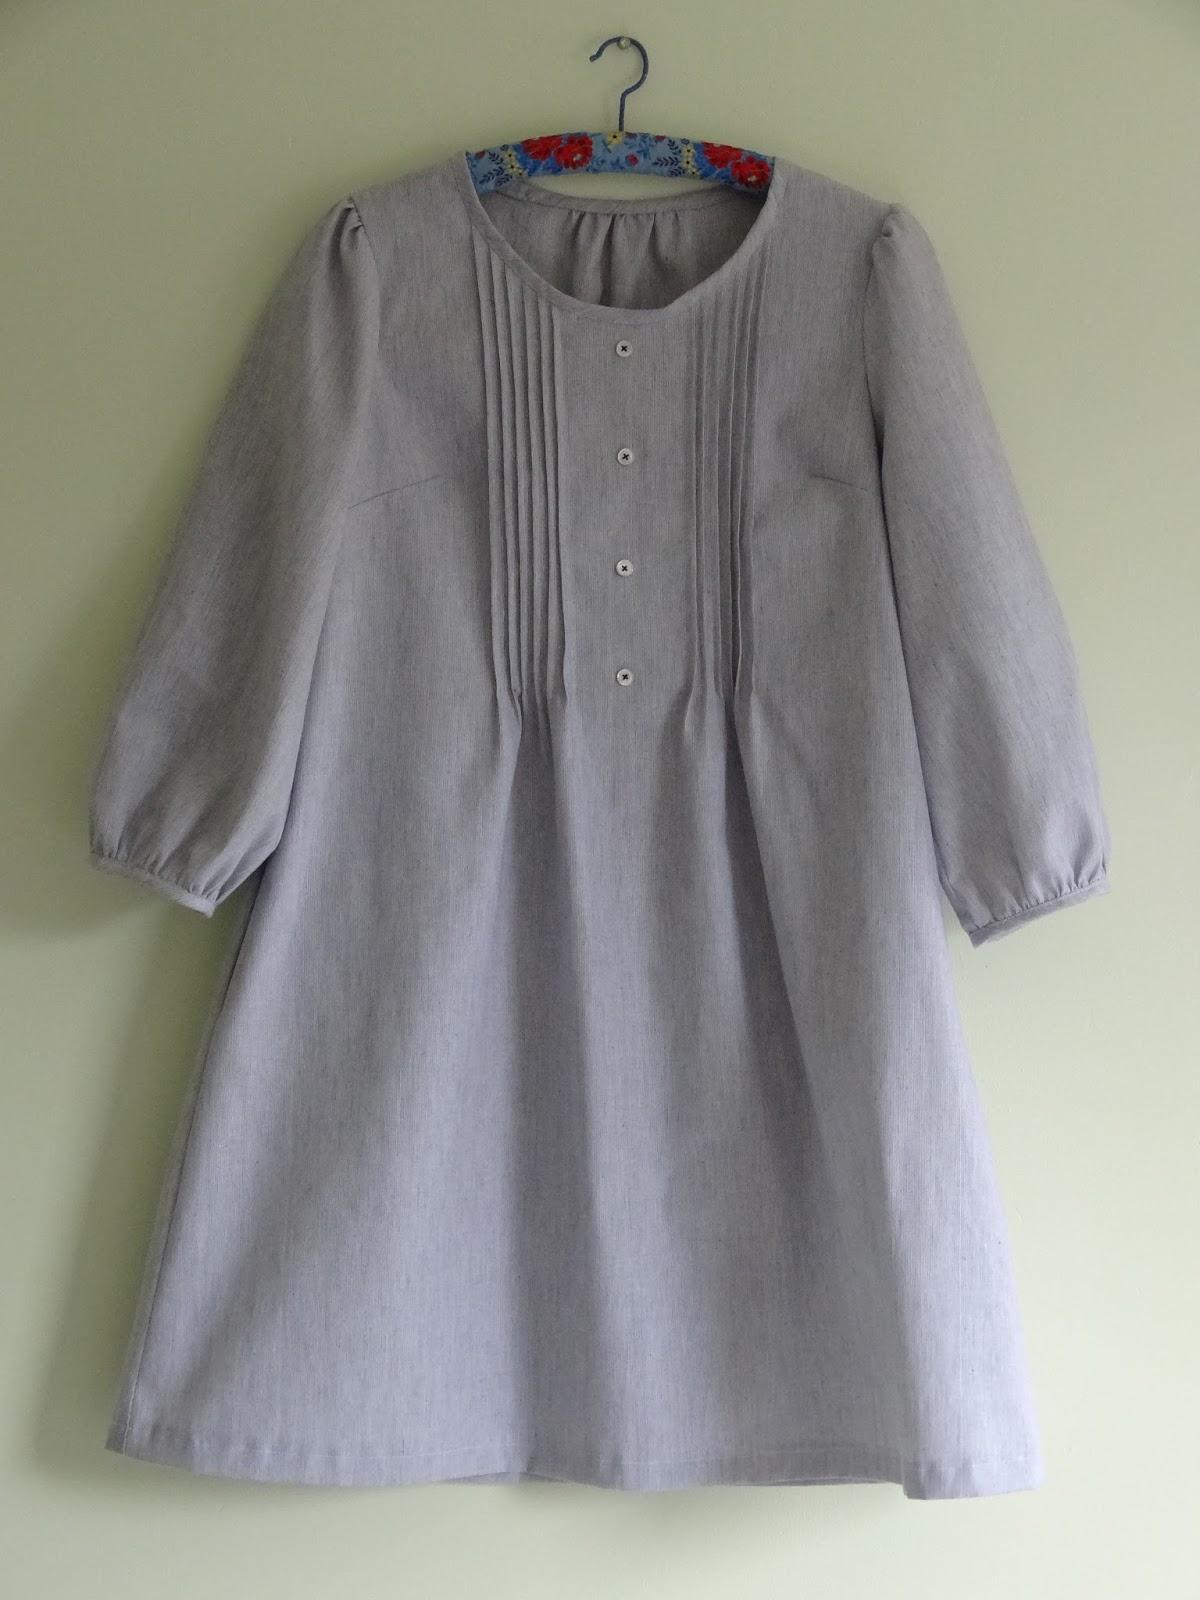 Marilla walker j dress with lovely pintucks j dress with lovely pintucks jeuxipadfo Image collections